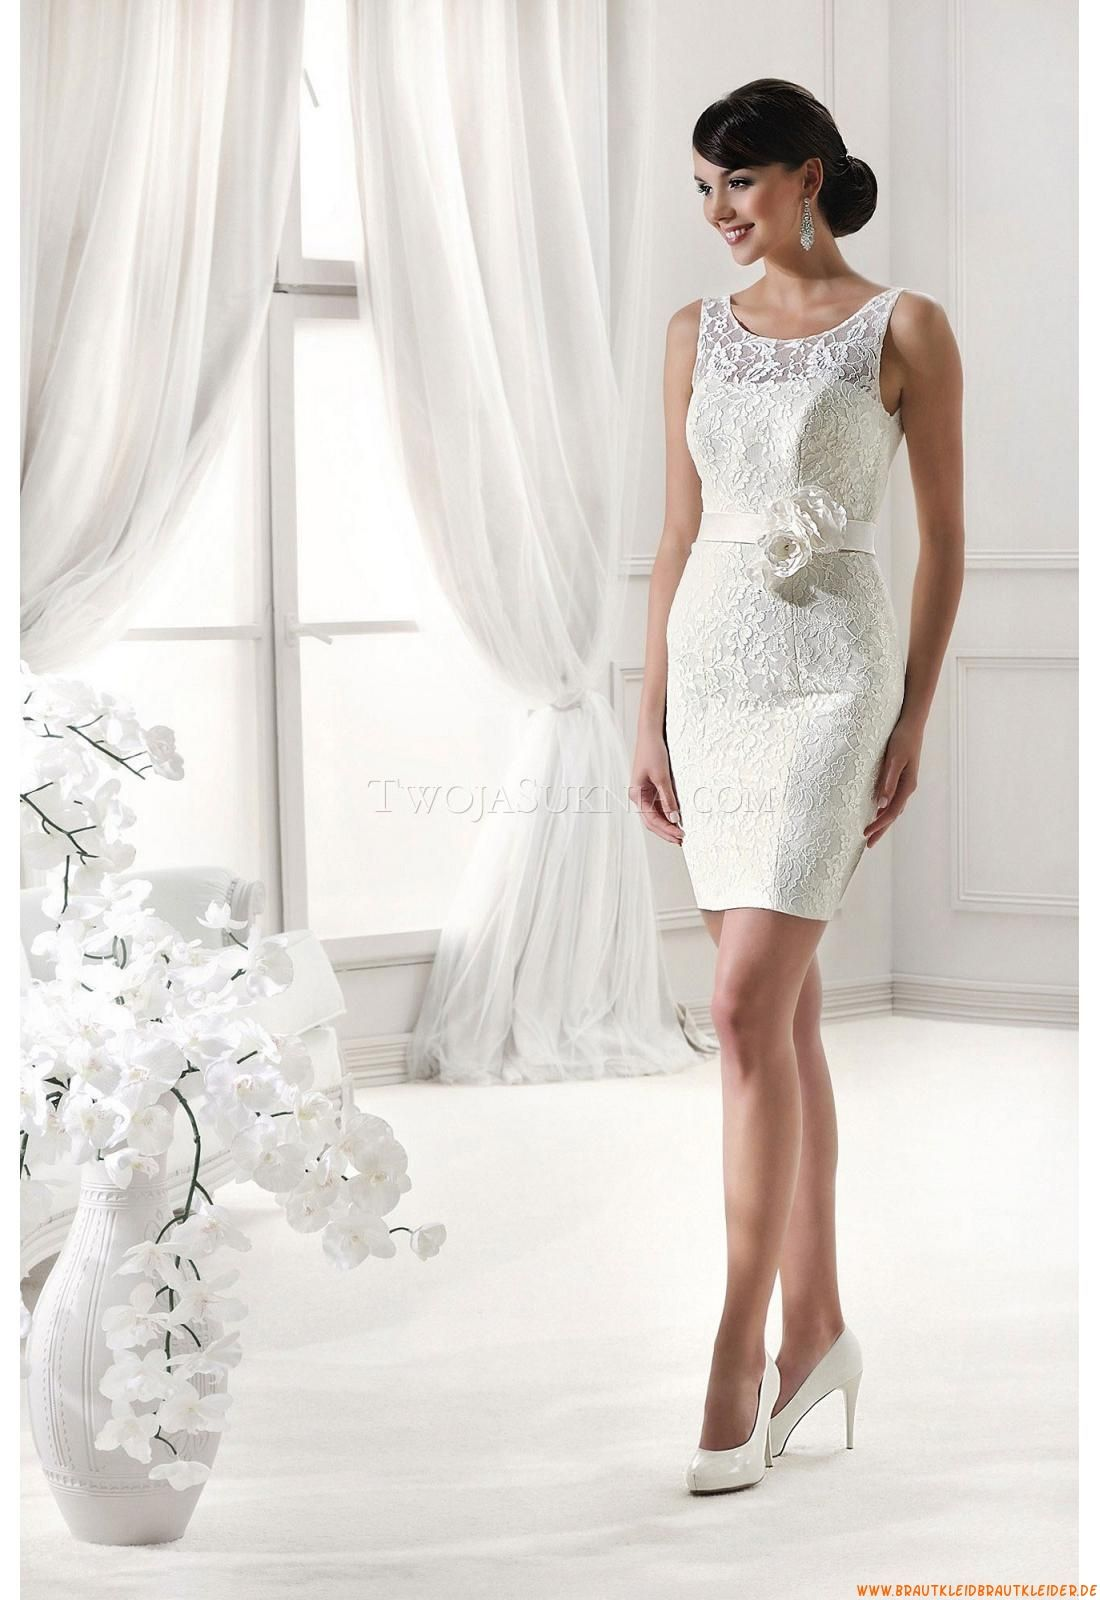 elegante kurze brautkleider aus spitze vintage wedding dresses pinterest wedding. Black Bedroom Furniture Sets. Home Design Ideas